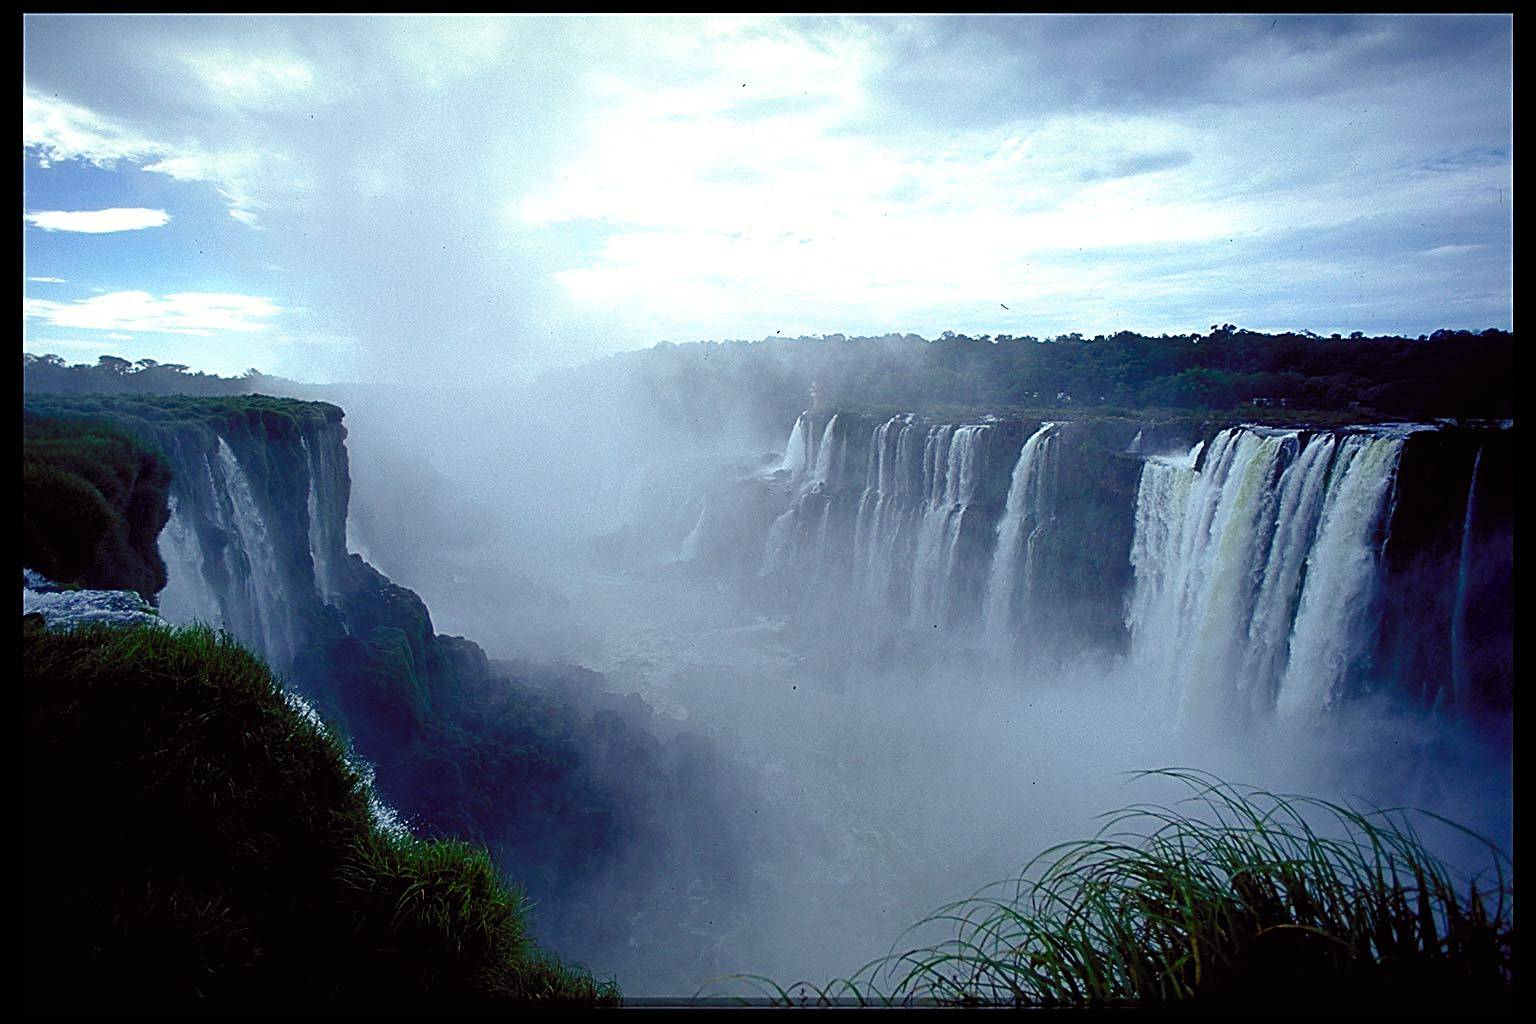 Cataratas de Iguazú espectacular foto